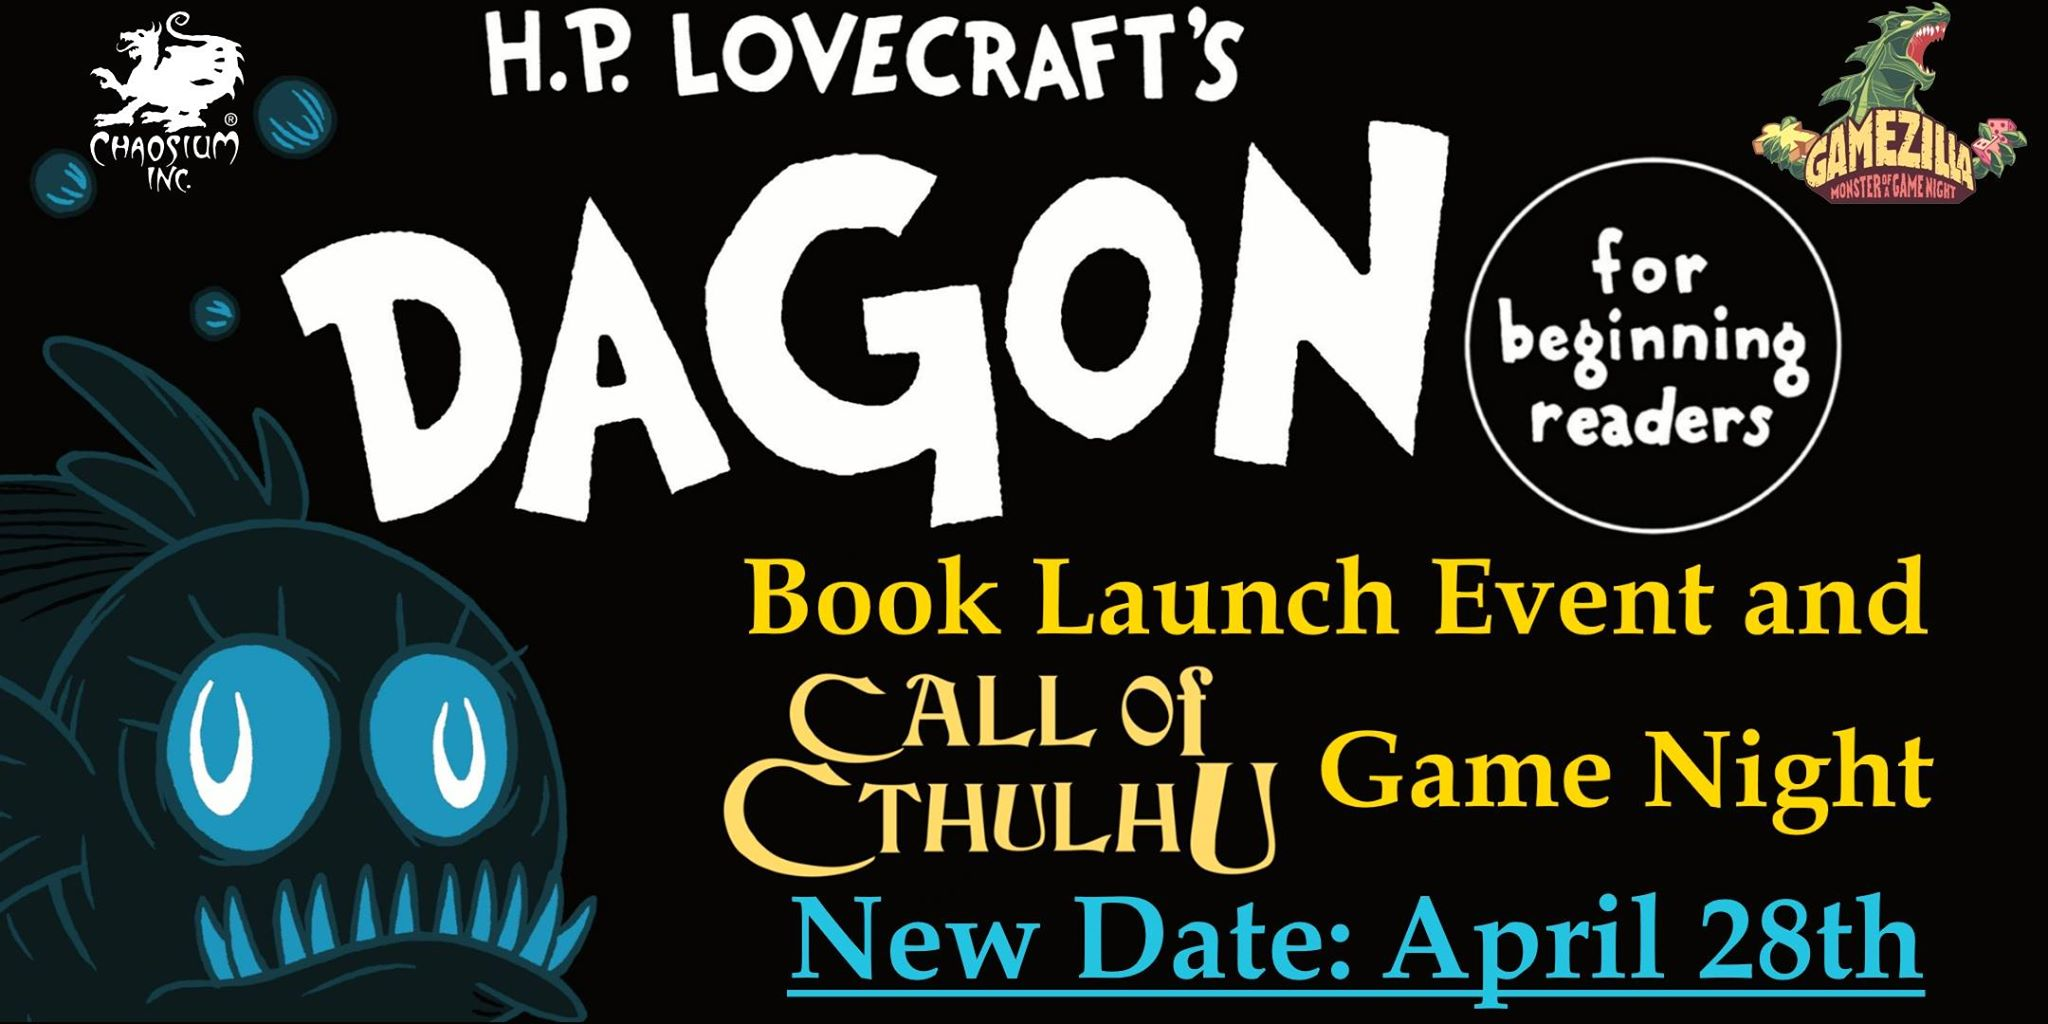 Dagon Launch - Melbourne, Australia April 28th